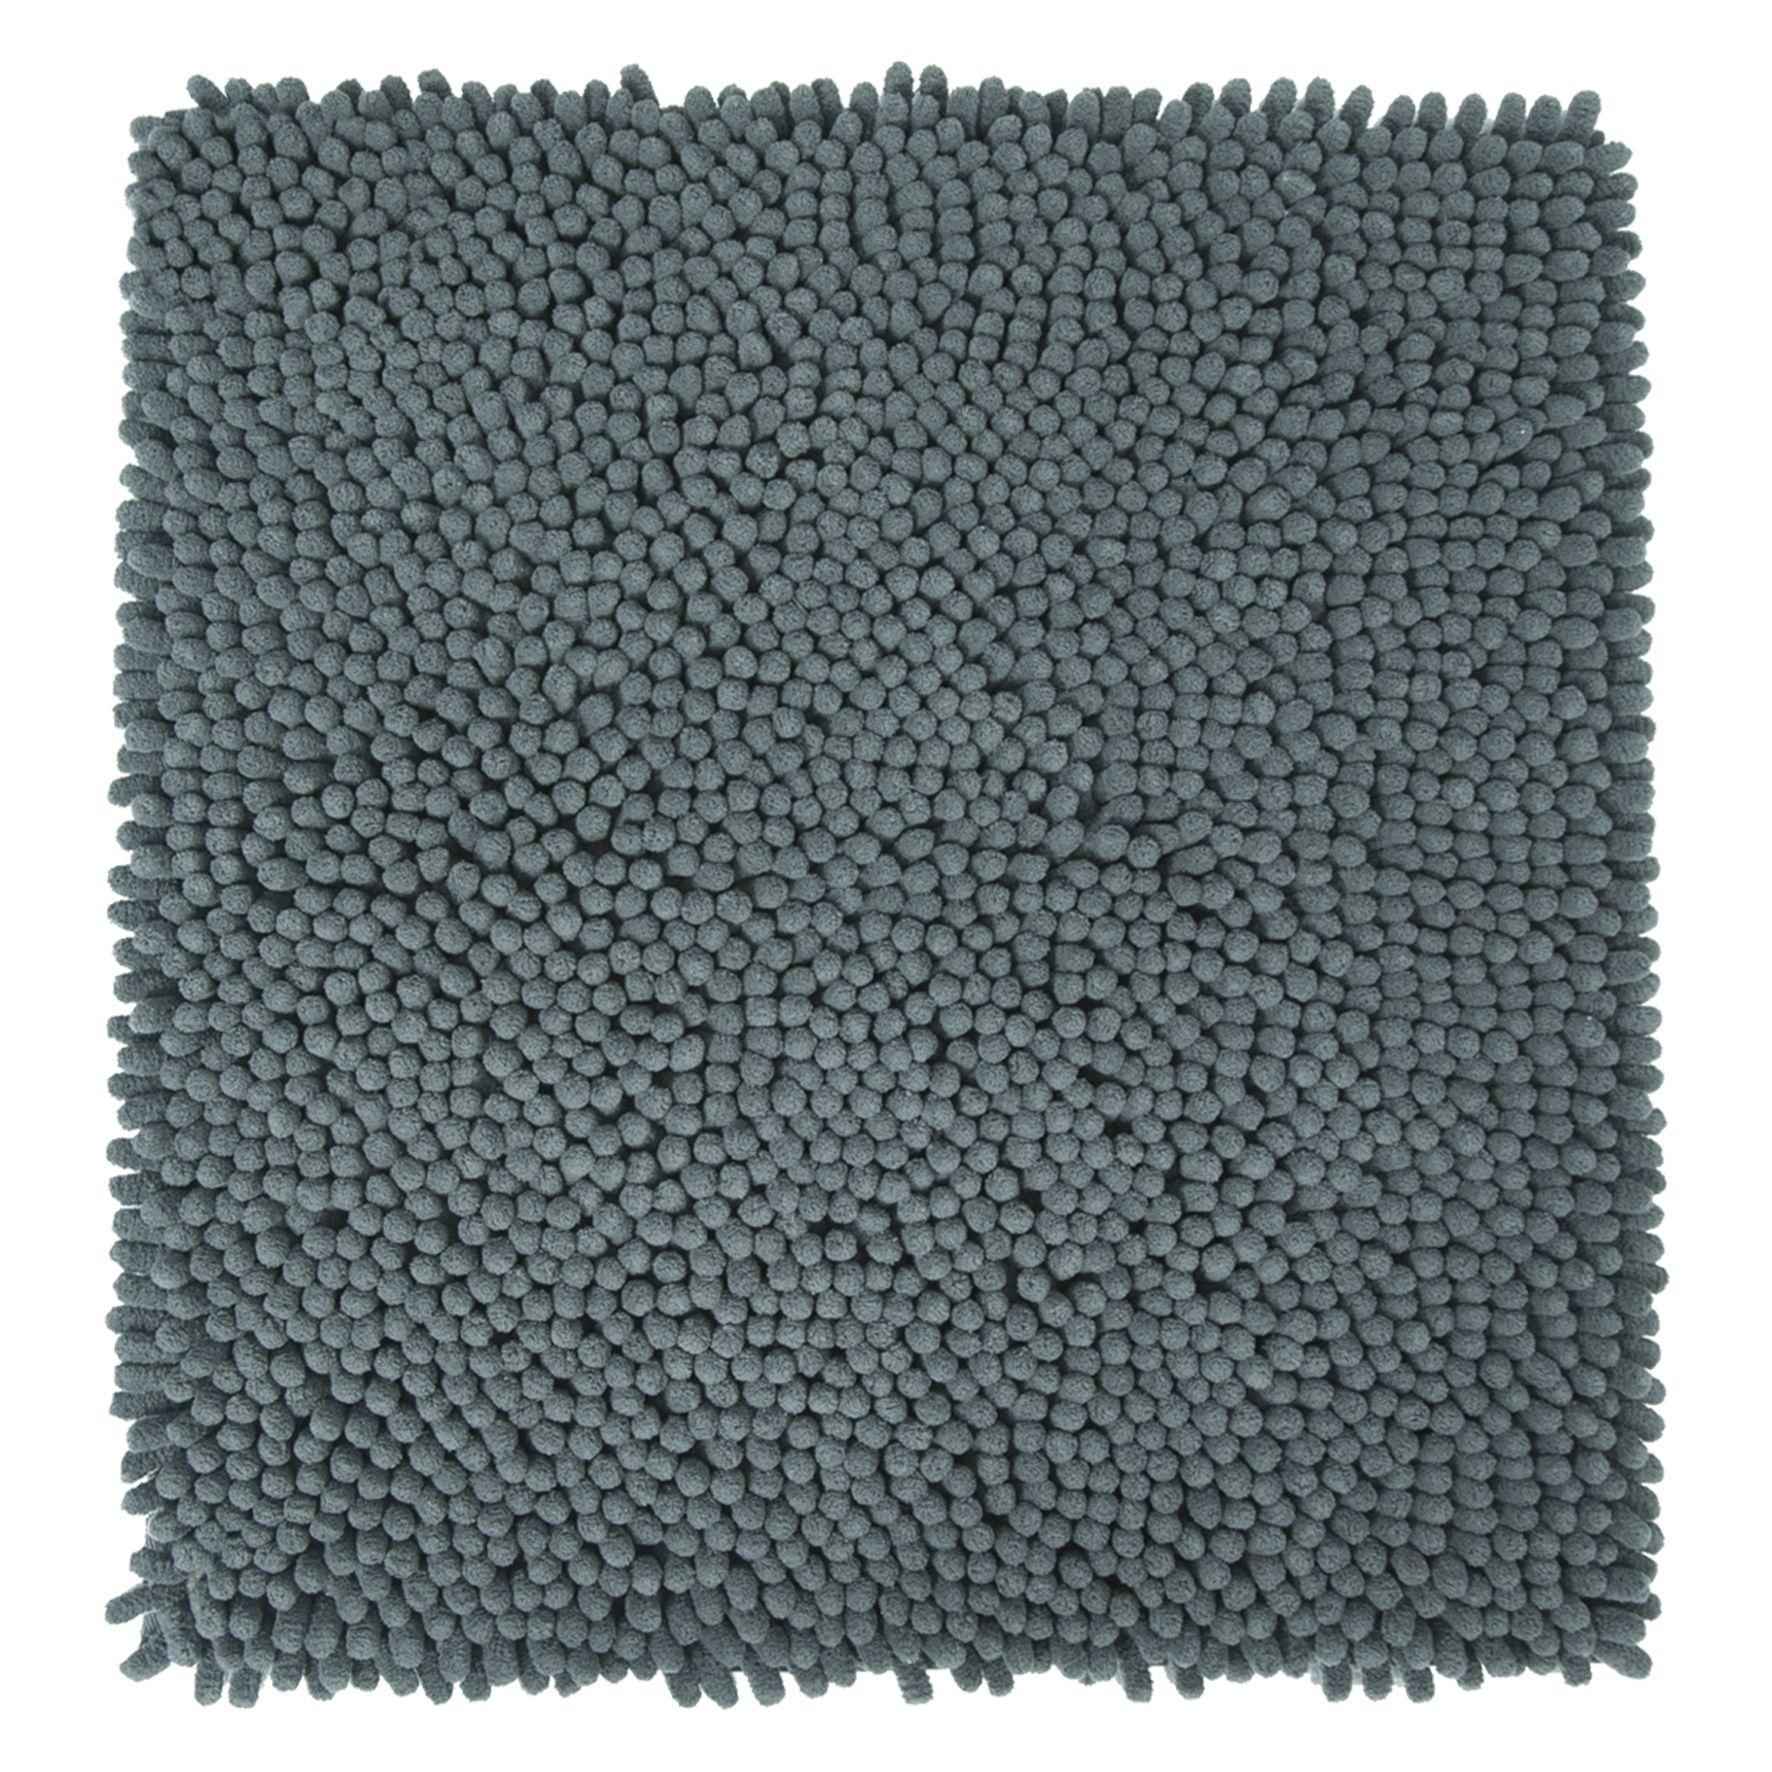 Differnz Chenille Shaggy badmat 60x60 grijs